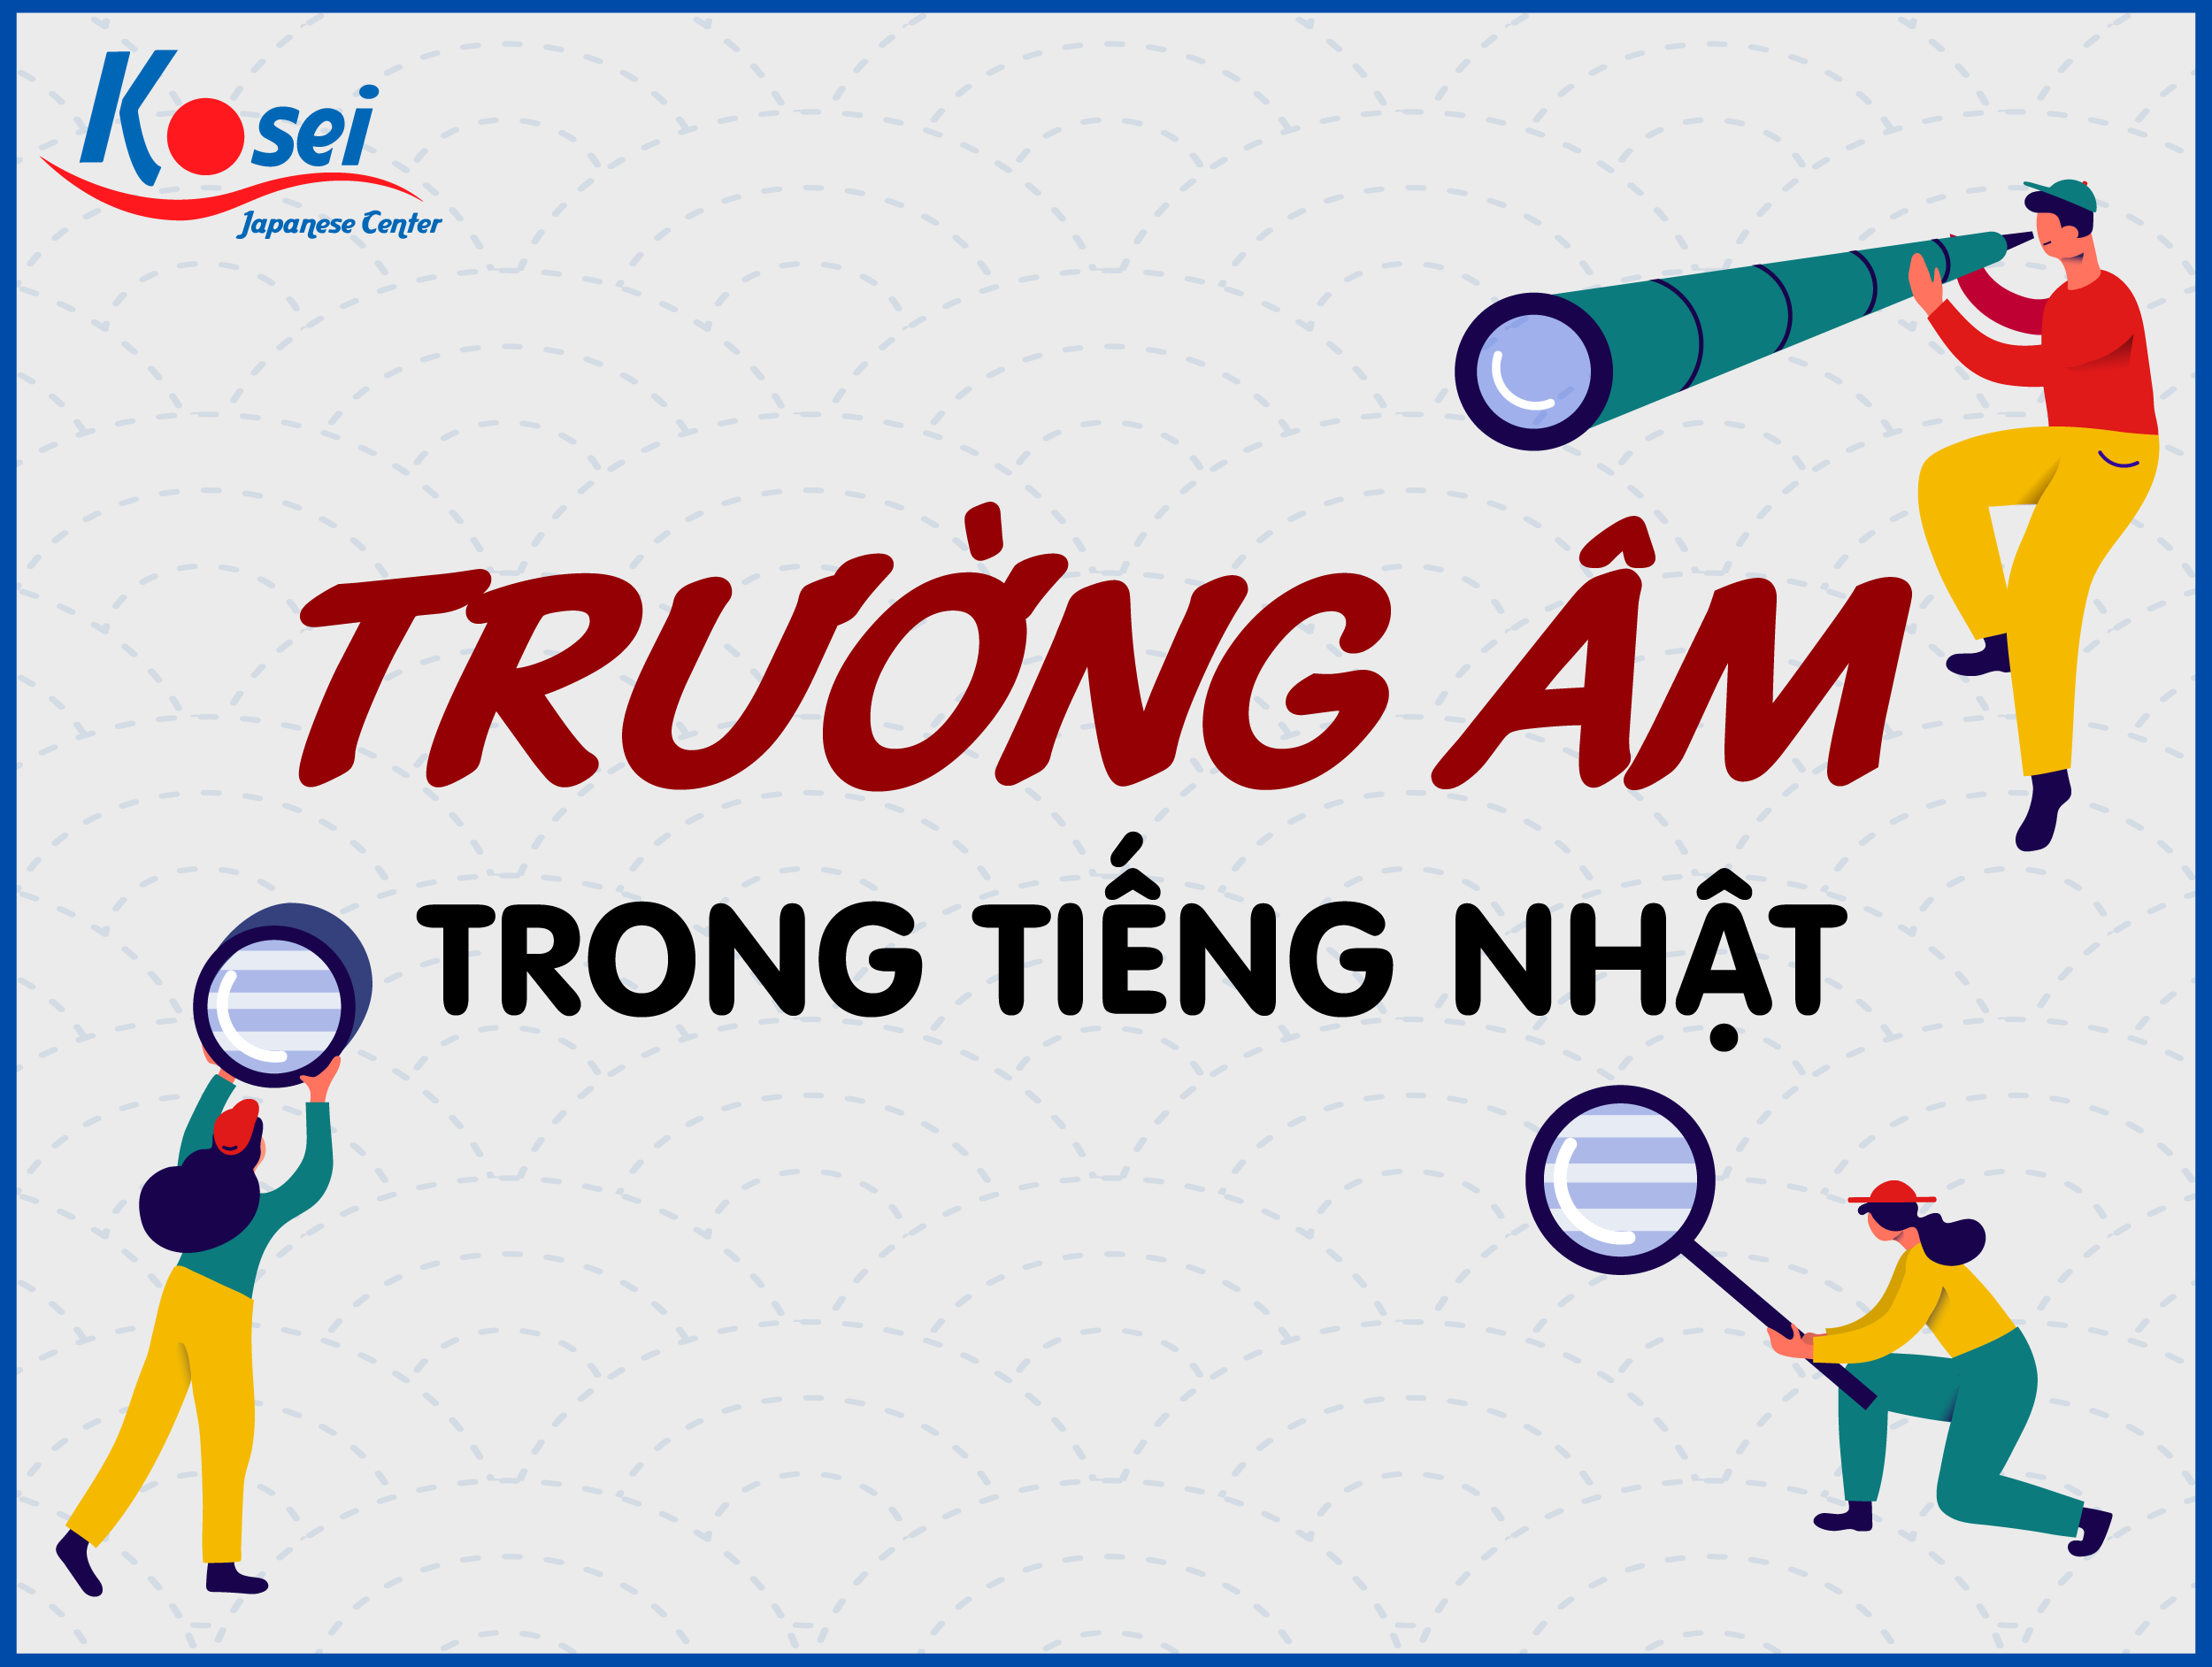 https://kosei.vn/truong-am-trong-tieng-nhat-ban-co-biet-n3170.html